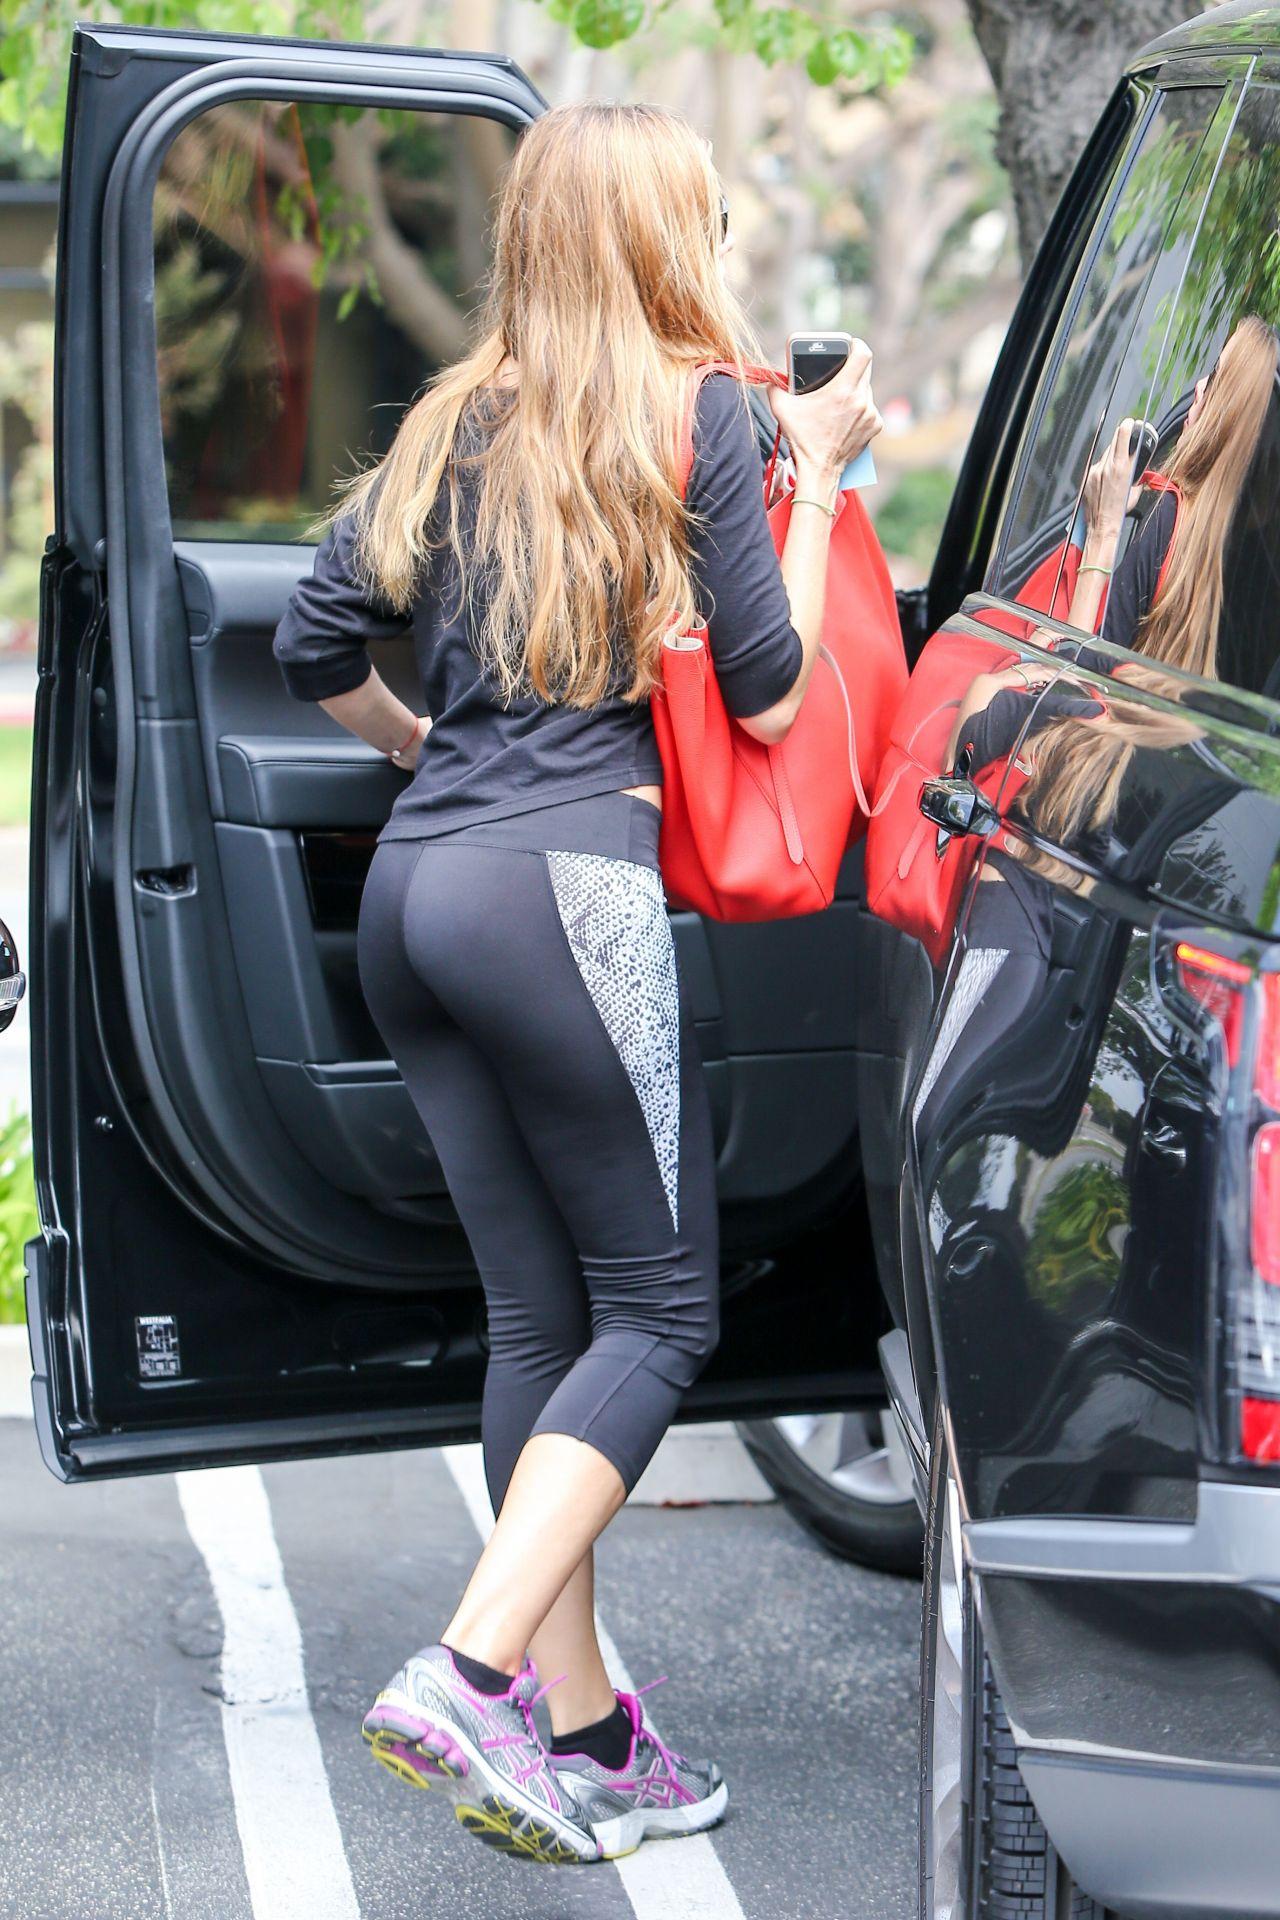 Sofia Vergara Booty in Tights at a Gym in Los Angeles - September 2014 • CelebMafia